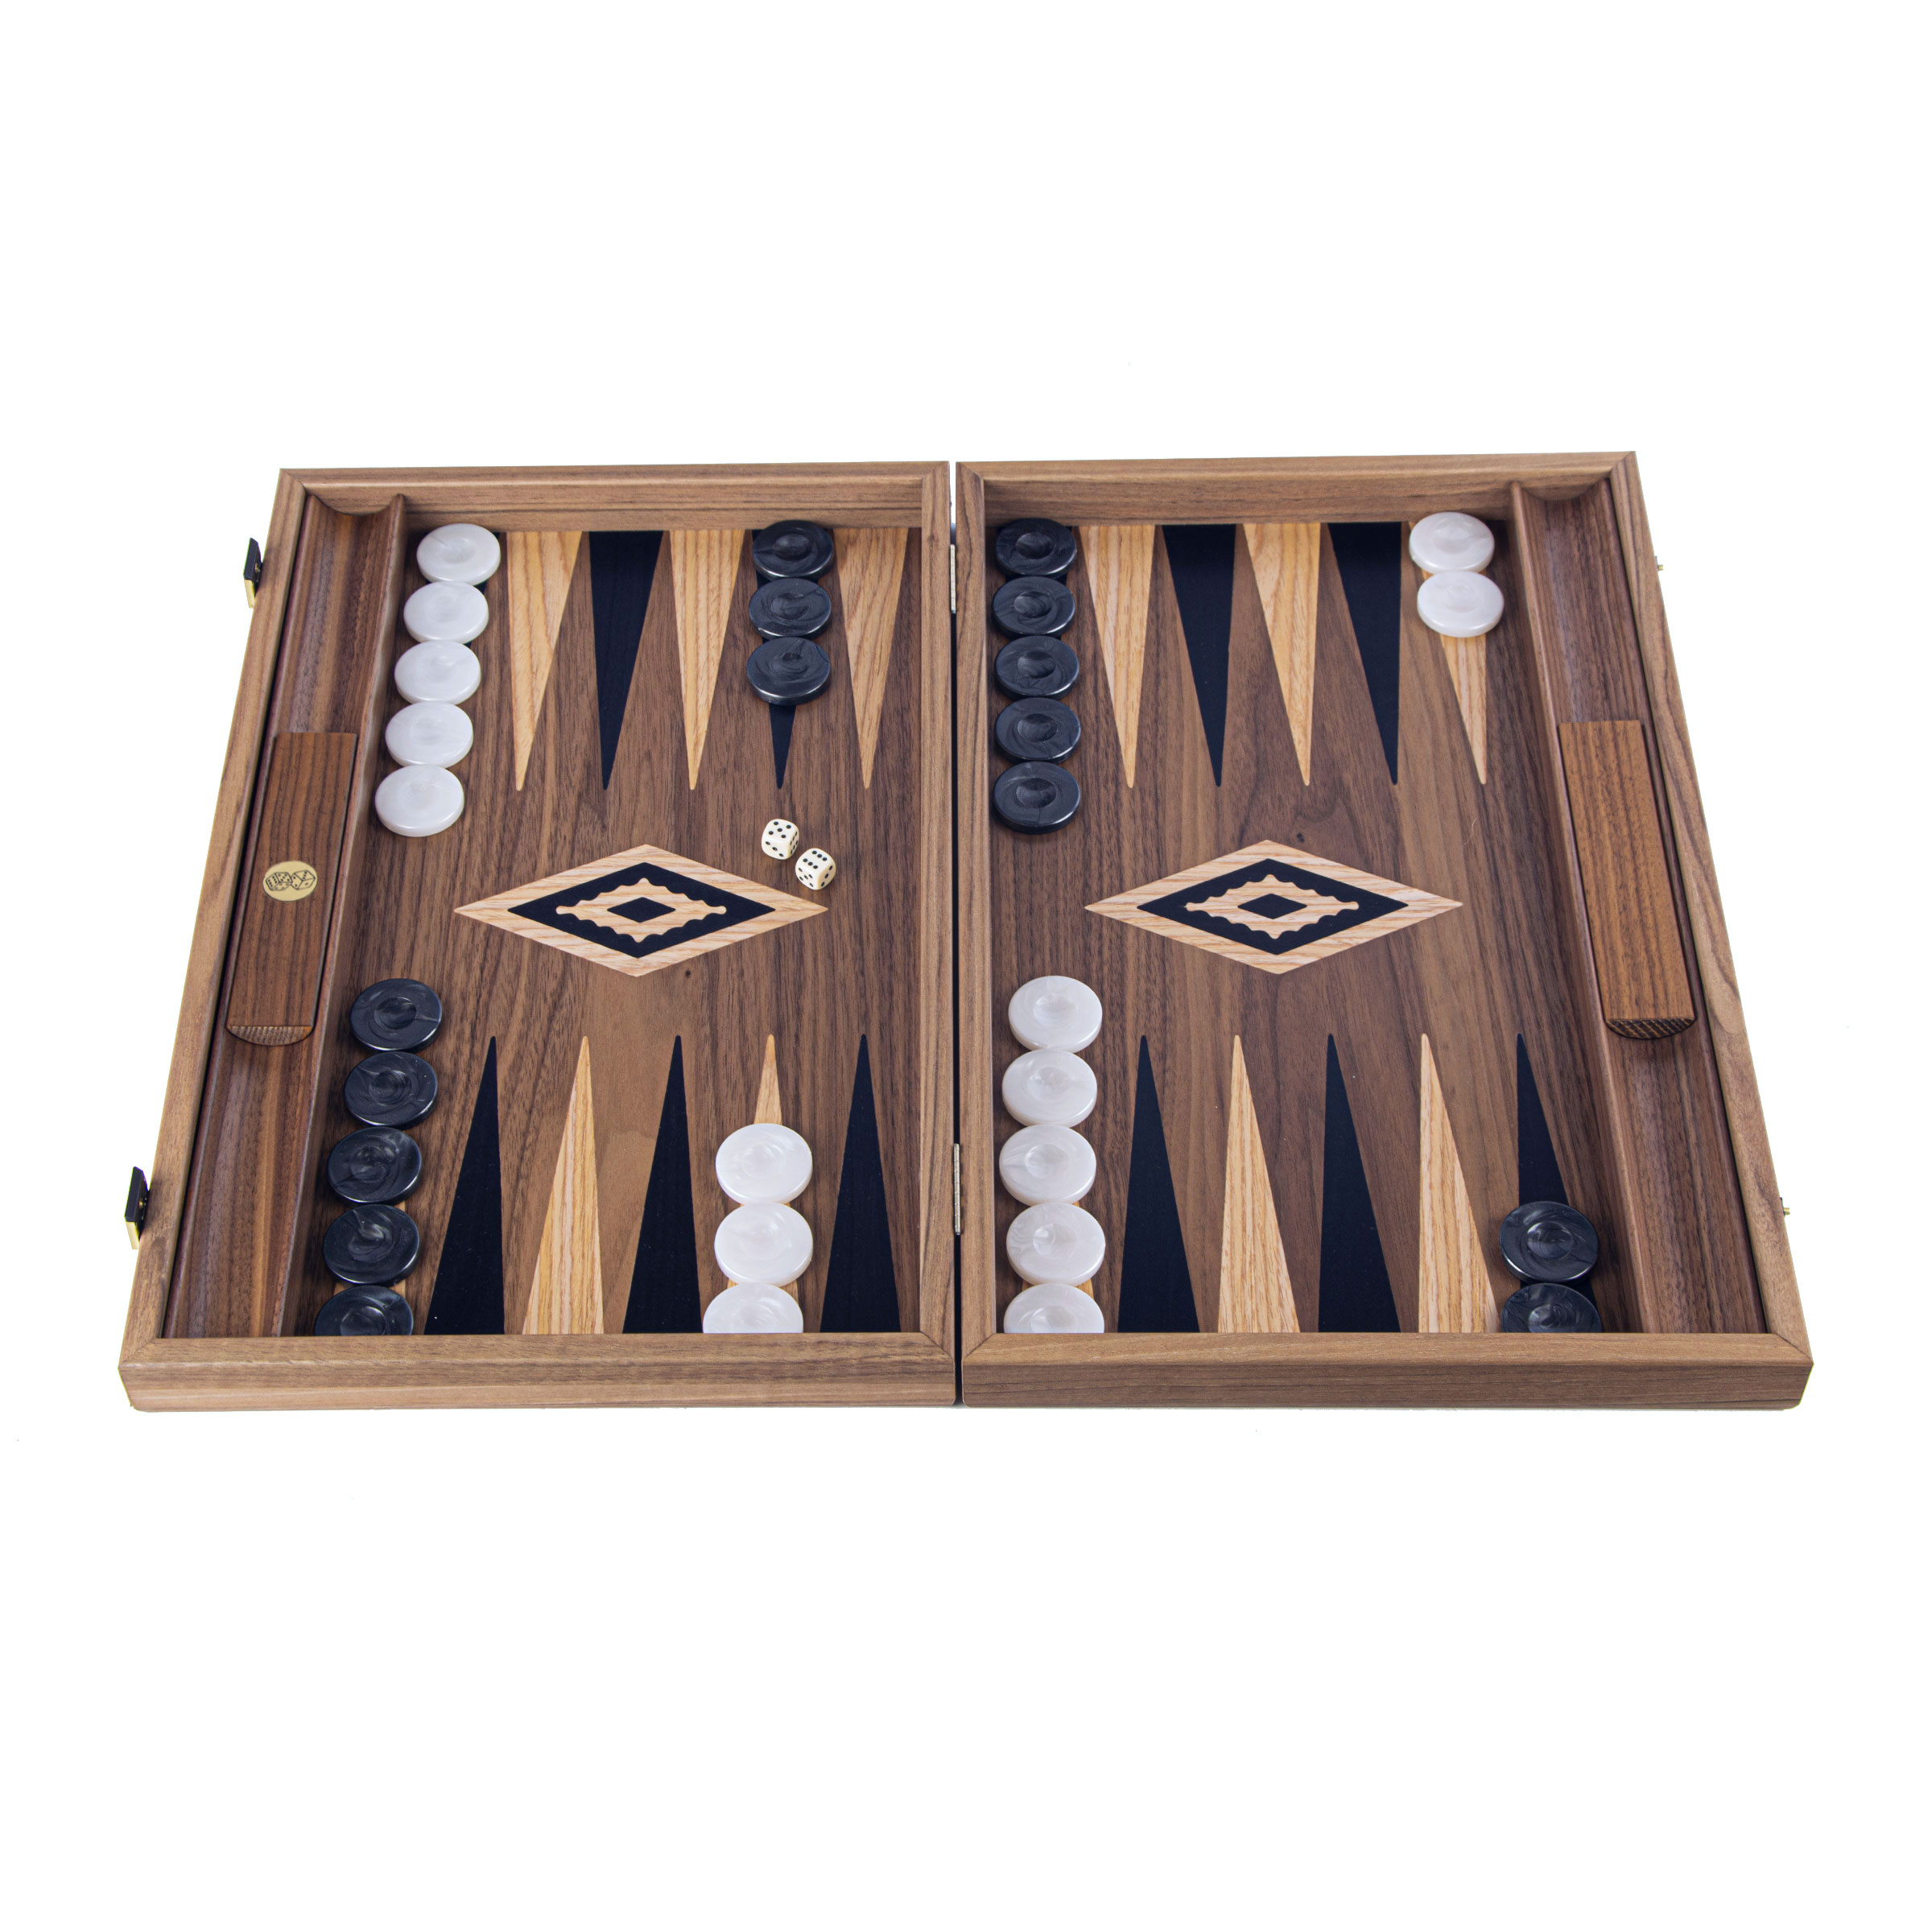 Luxury Backgammon Set Walnut with inlay